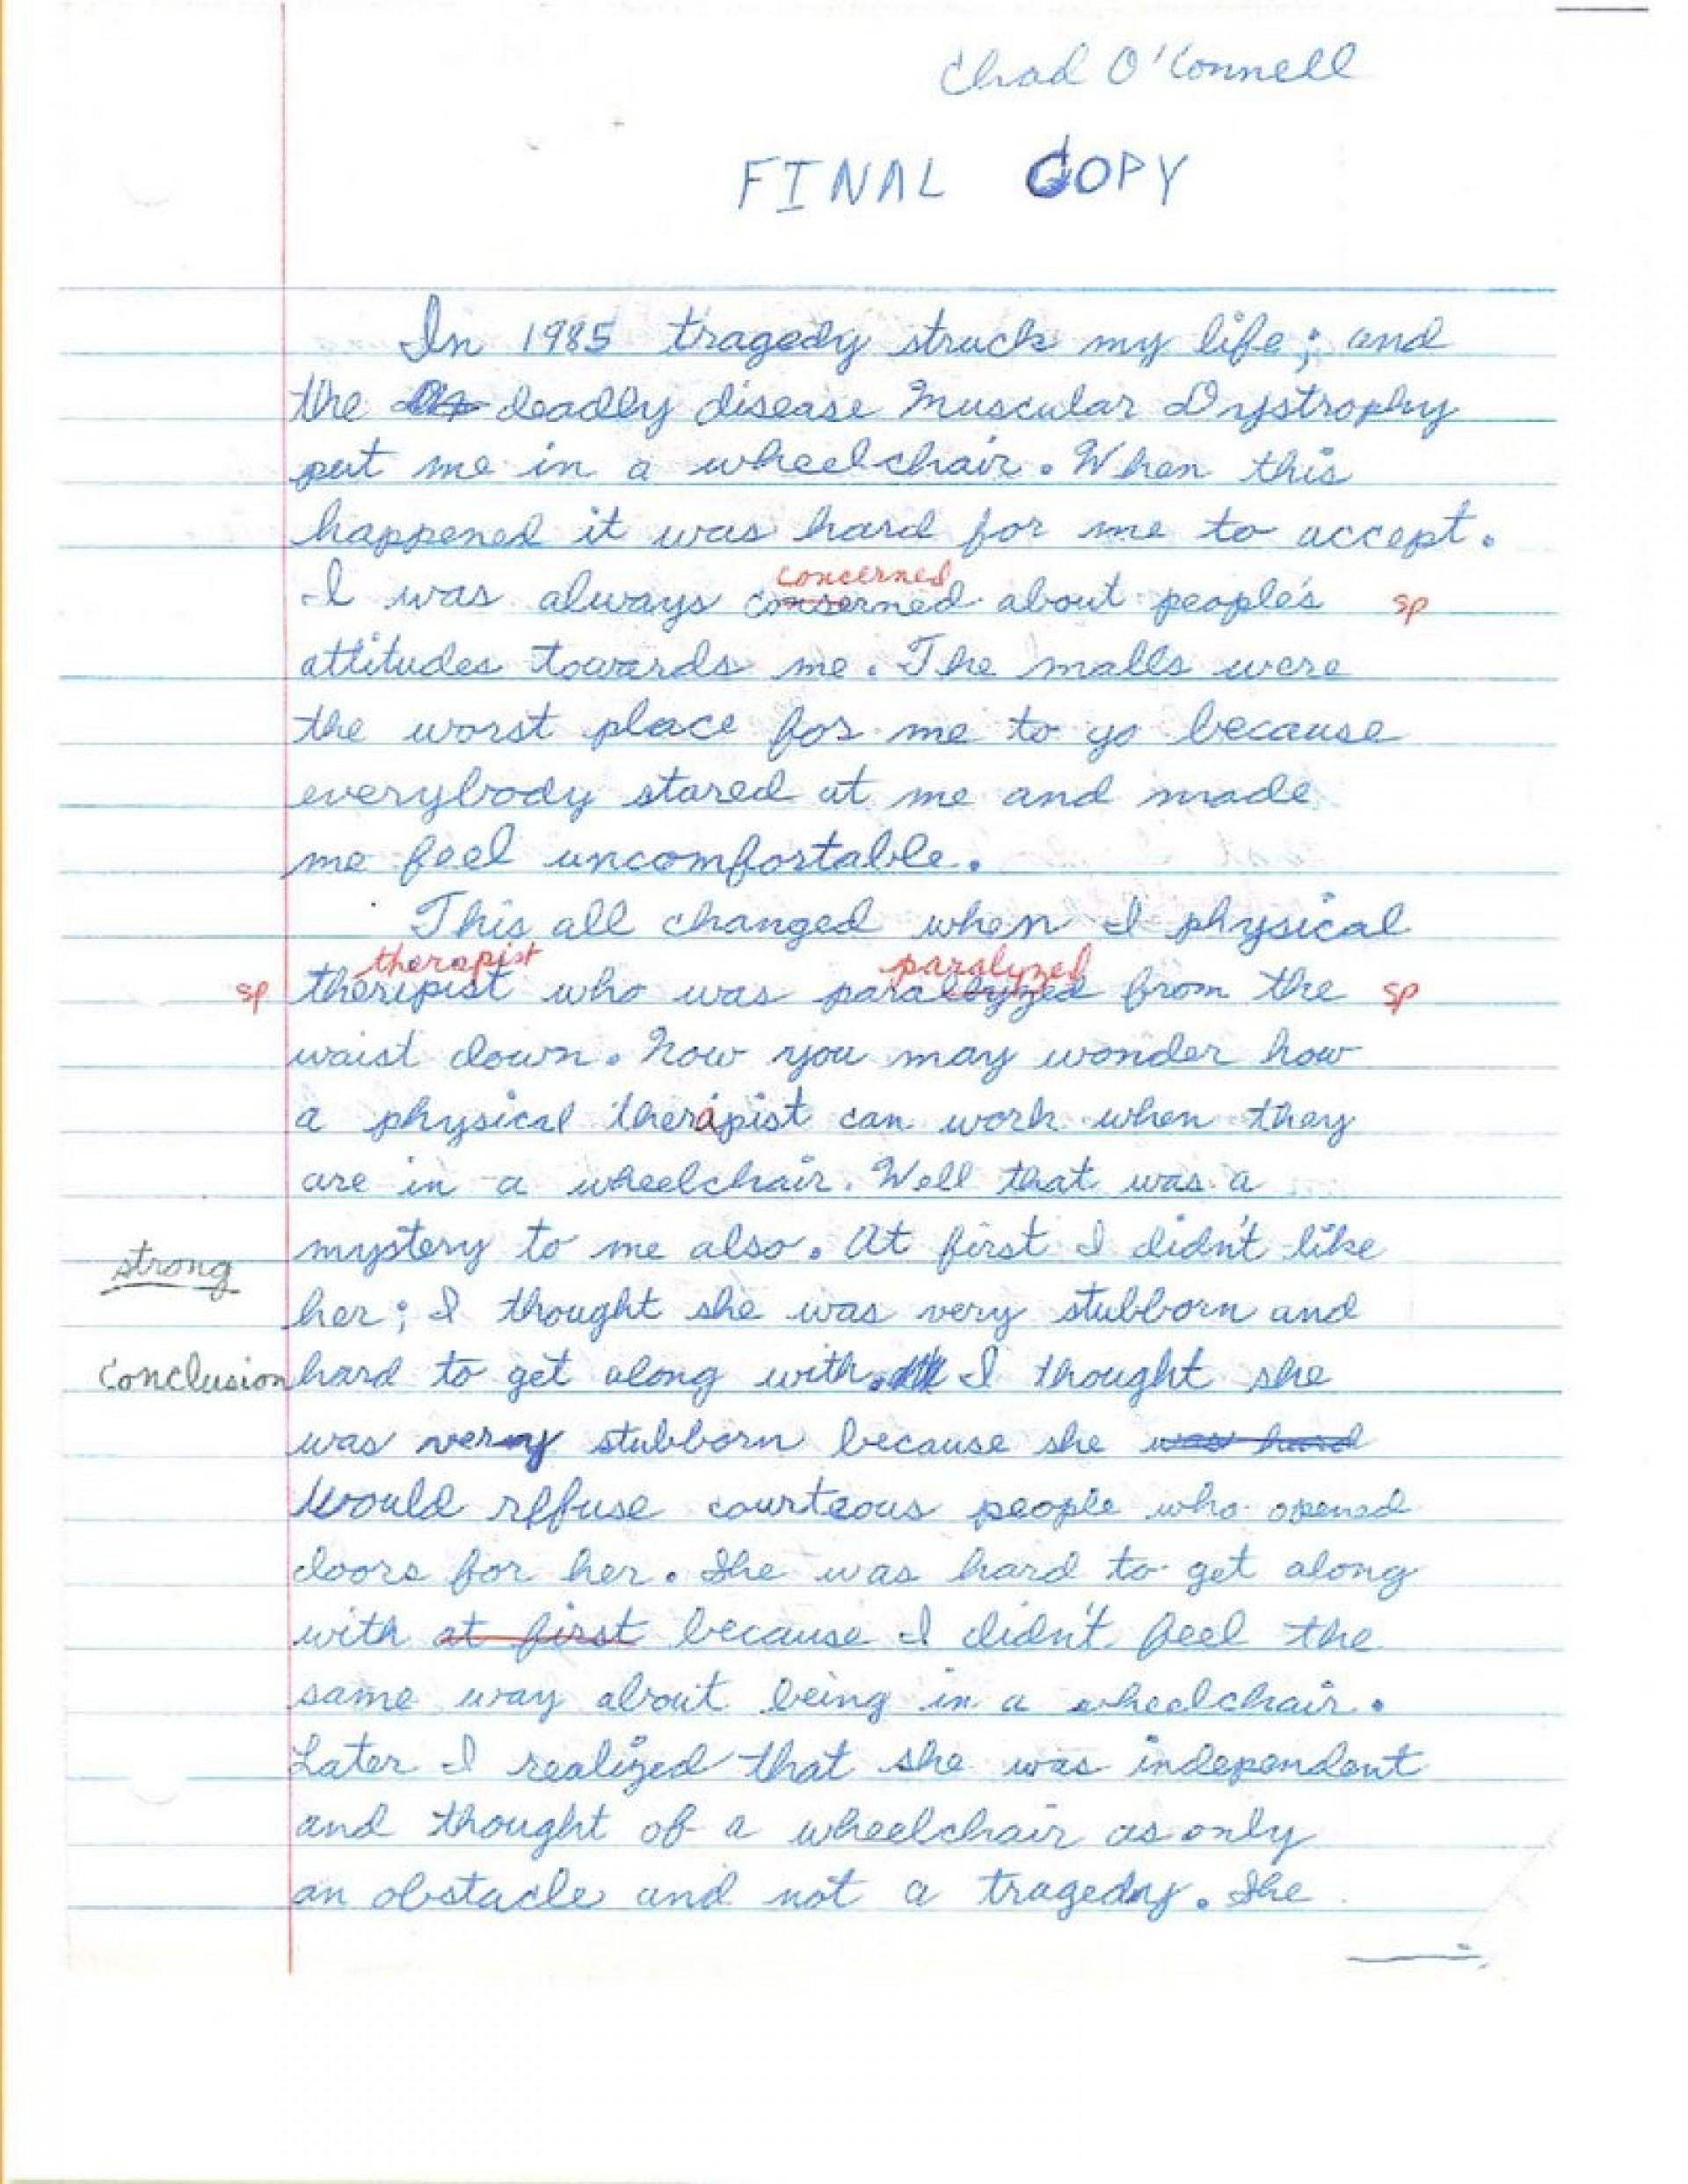 012 Essay Example Childhood Memory 526337 O Top Ideas Earliest My Memories 1920